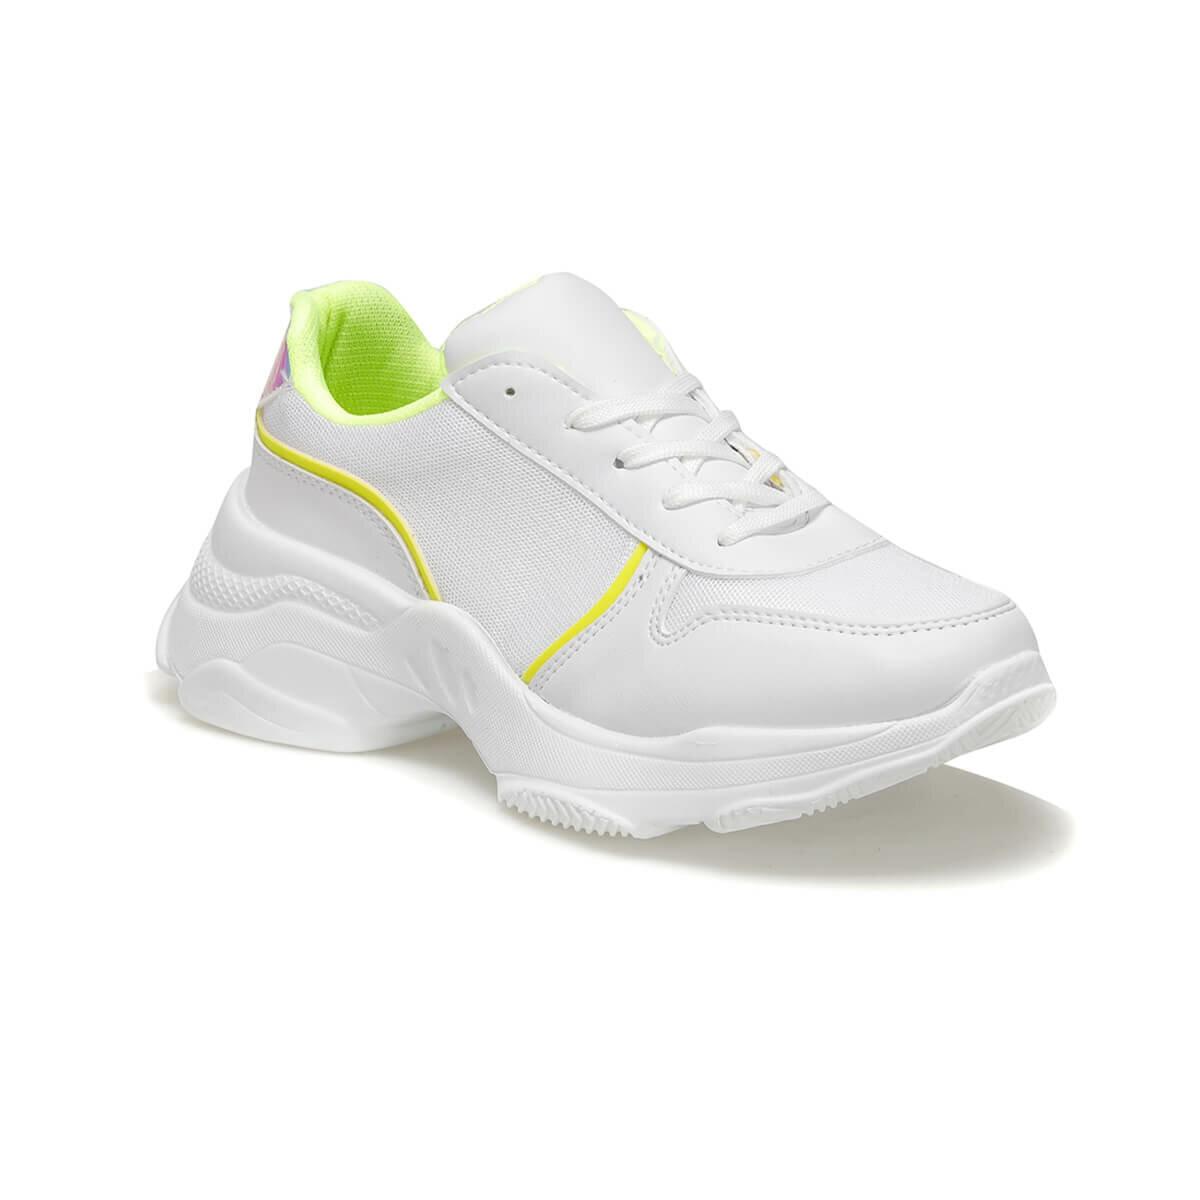 FLO 19SF-1620 White Women 'S Sneaker BUTIGO